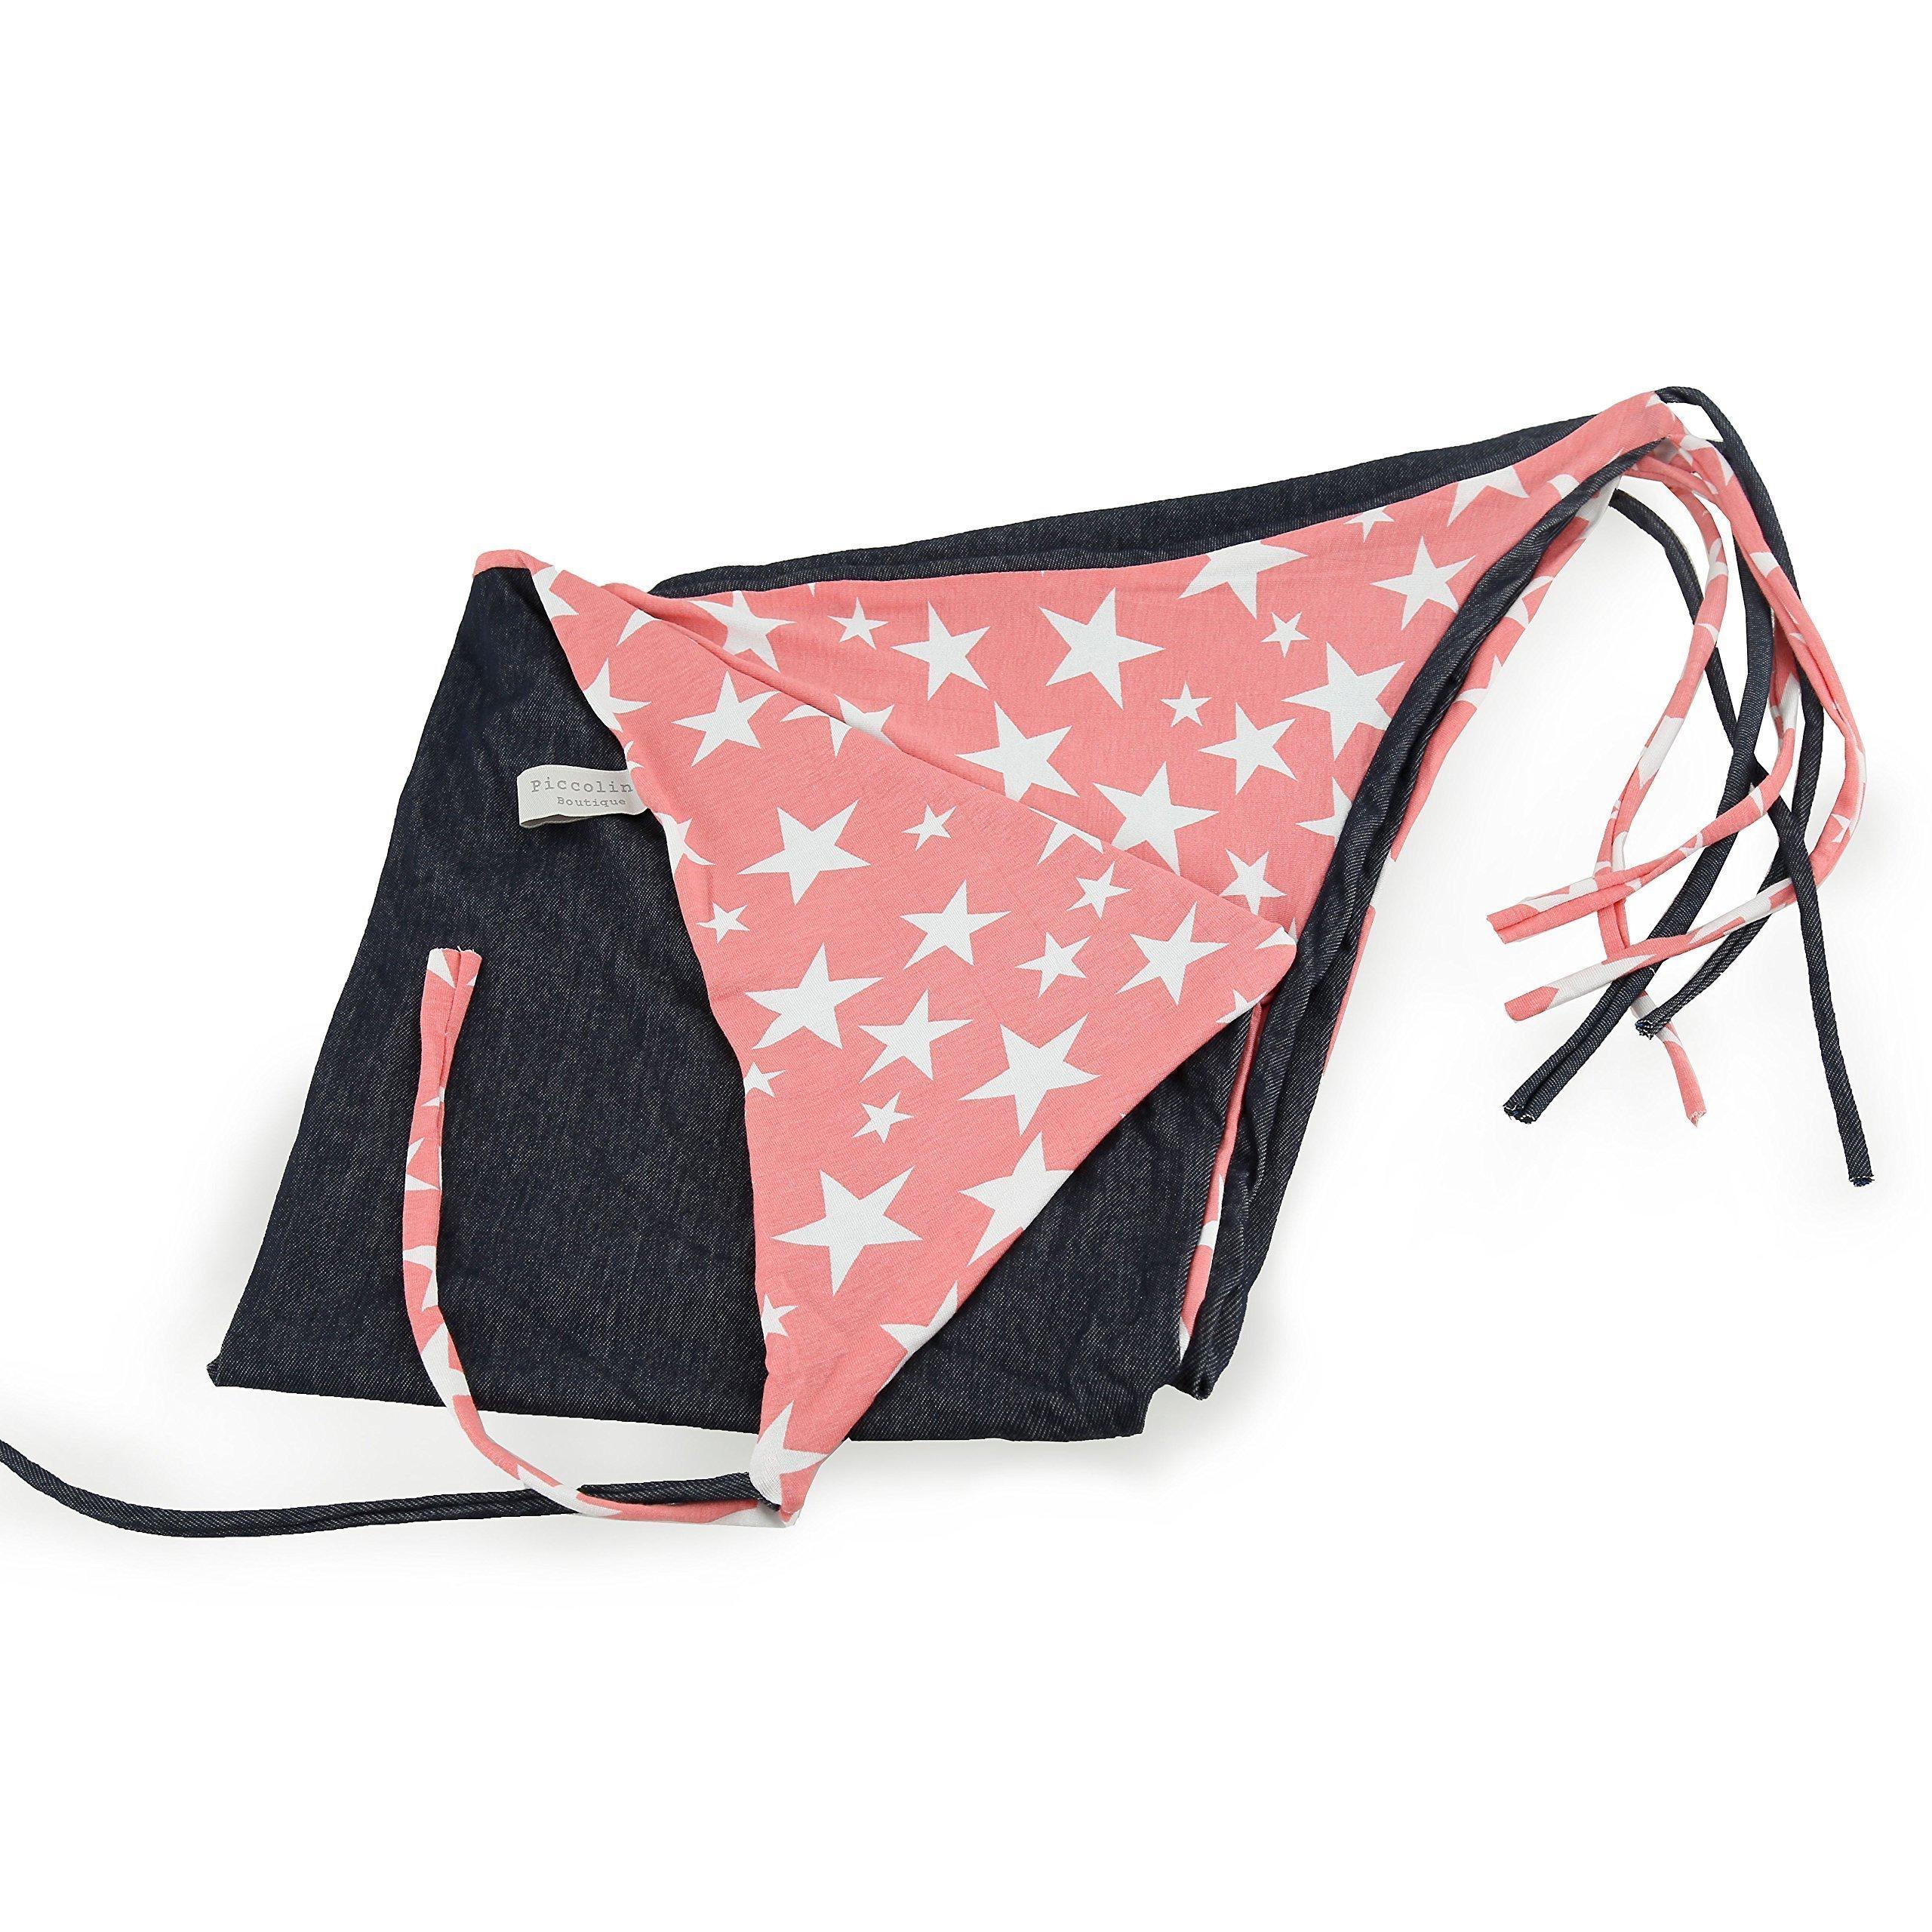 TWO-SIDED BABY BLANKET-STARS/Multifunctions:Baby tent,picnic blanket,nursing cover,stroller blanket